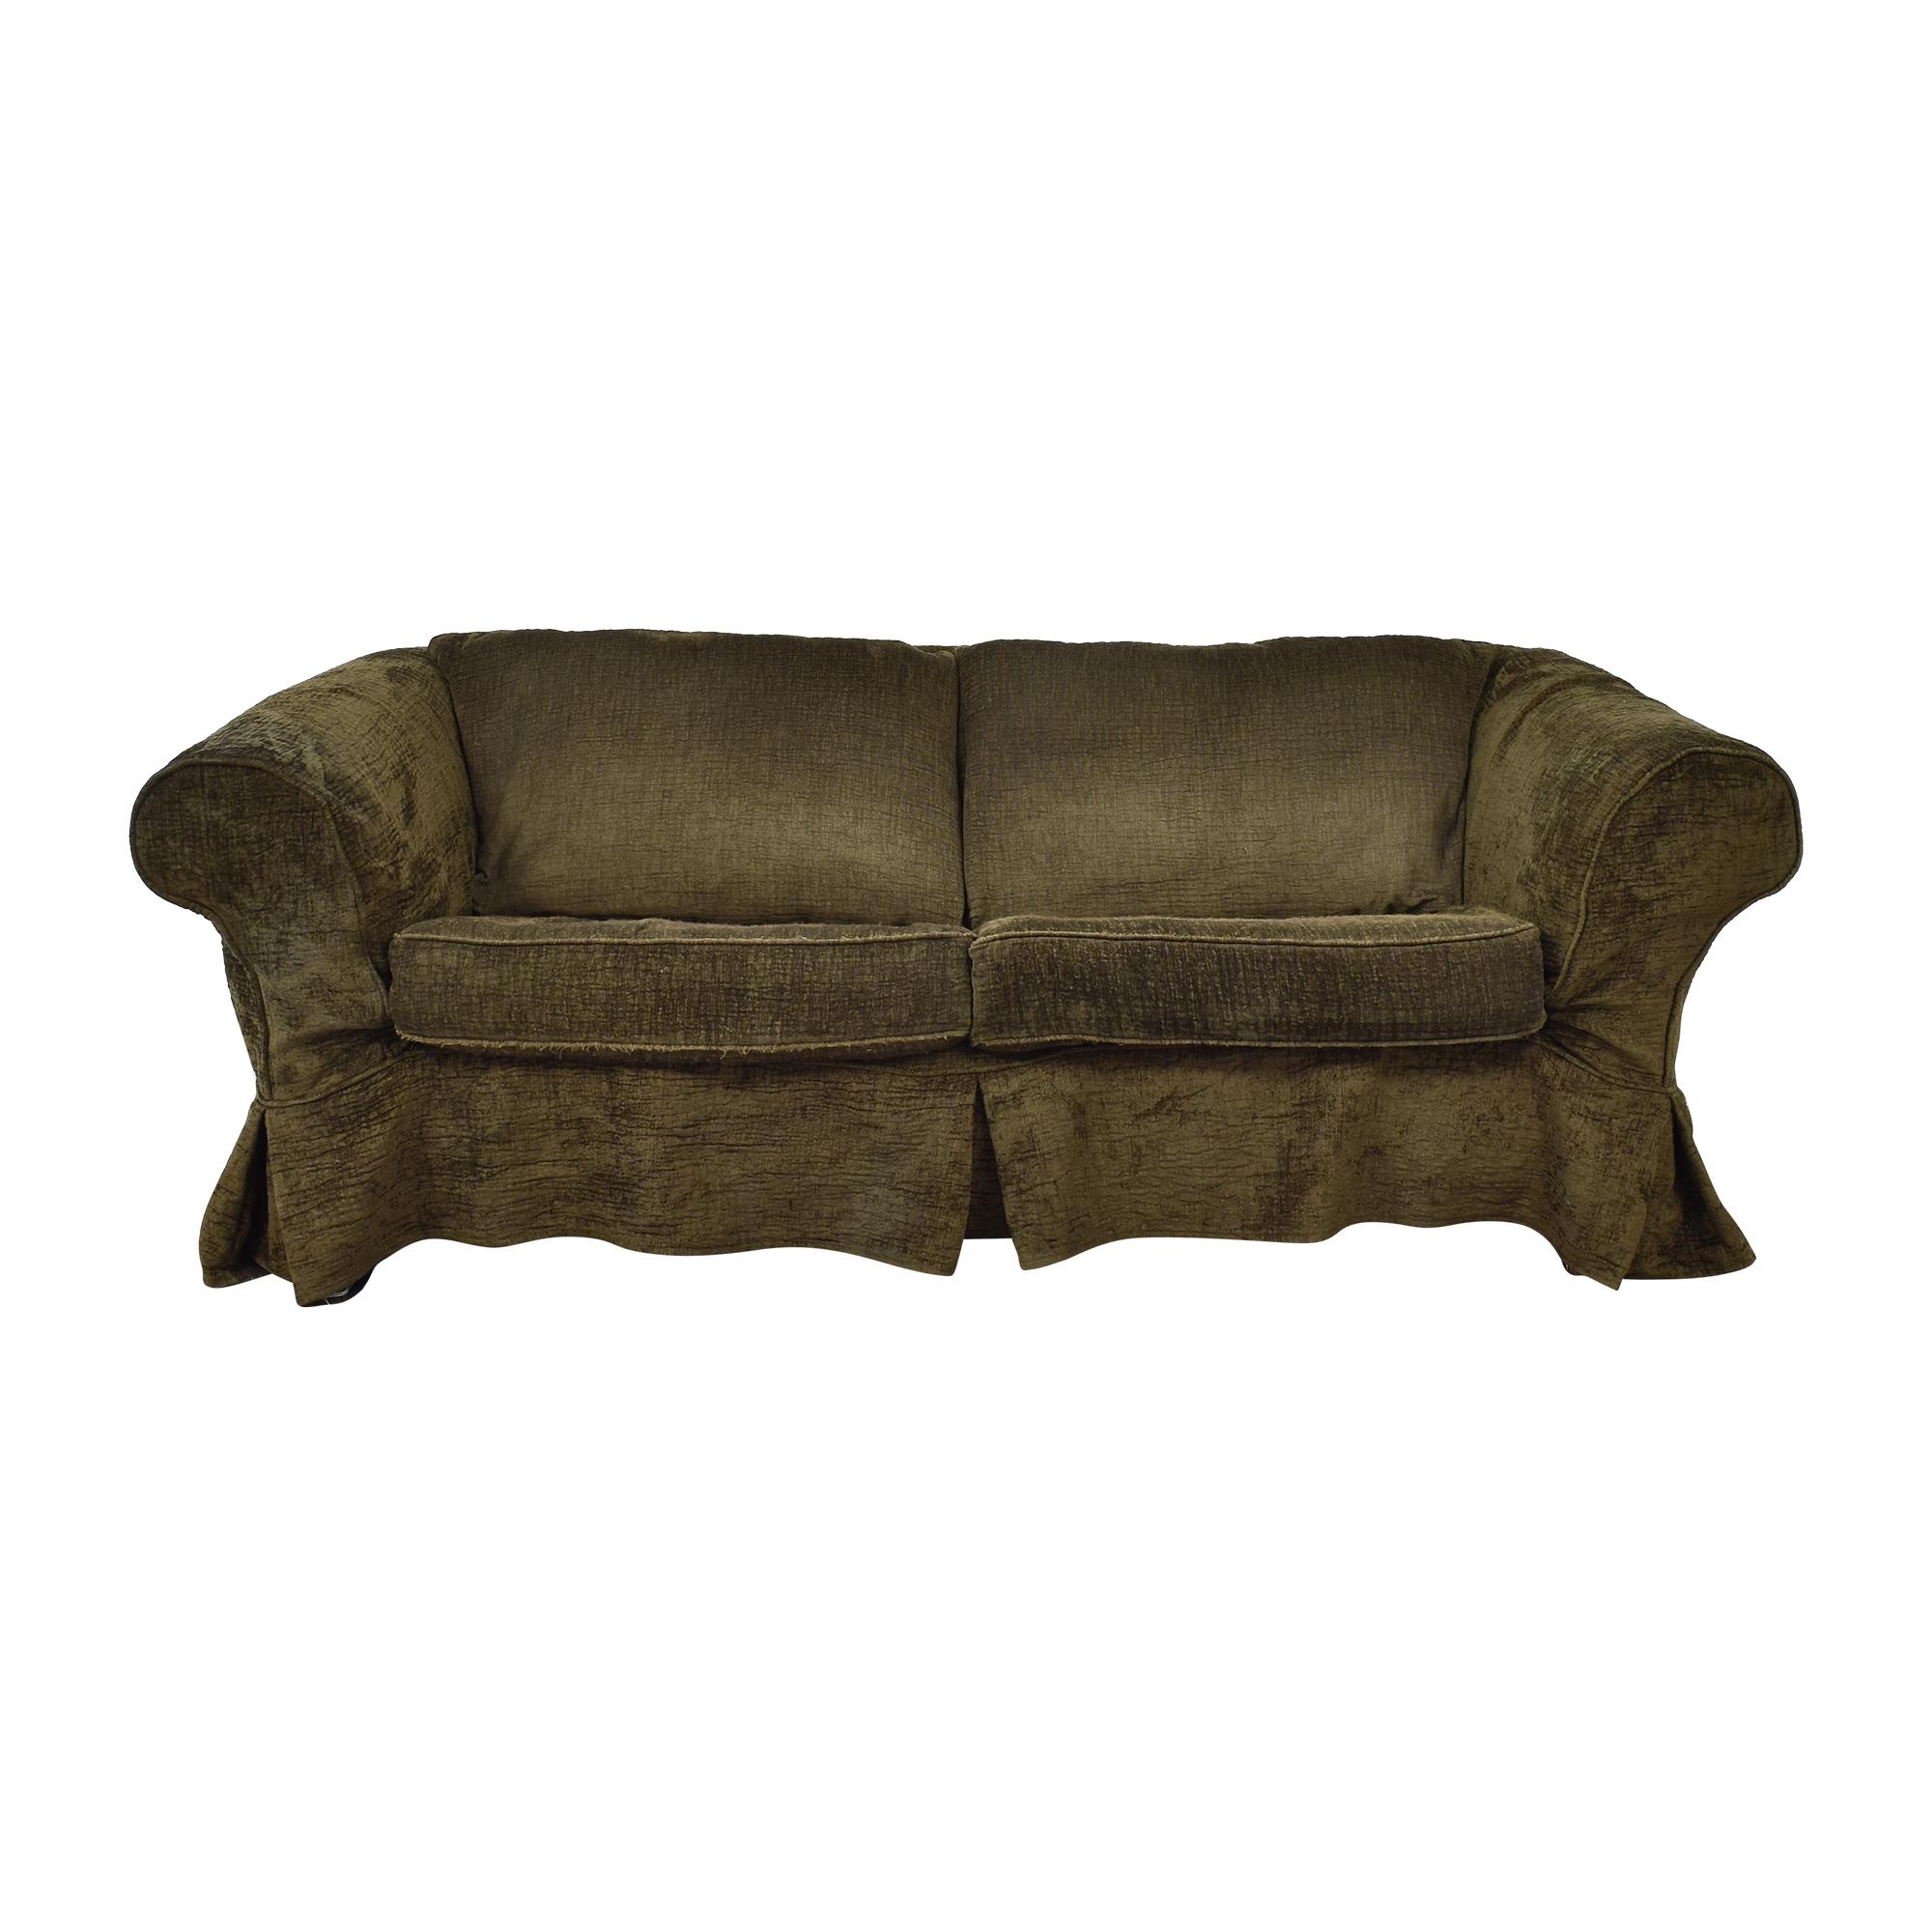 Mitchell Gold + Bob Williams Mitchell Gold Roll Arm Slipcovered Sleeper Sofa ma